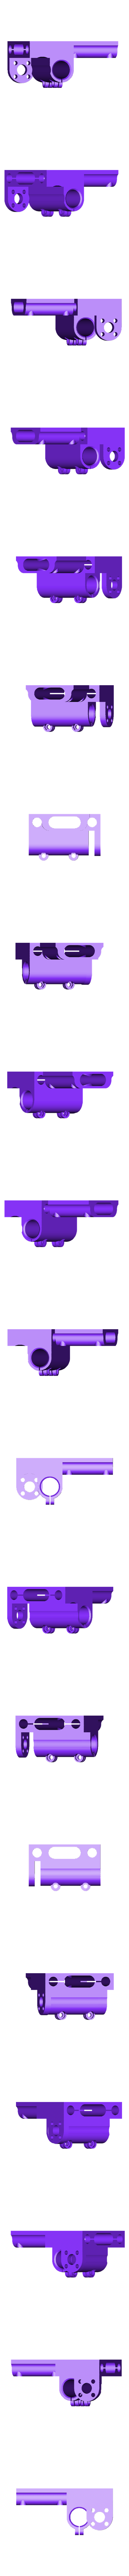 Minimal_x_axis_motor.stl Download free STL file Minimal X axis for Prusa I3 Steel - 8mm leadscrew • 3D print model, LionFox